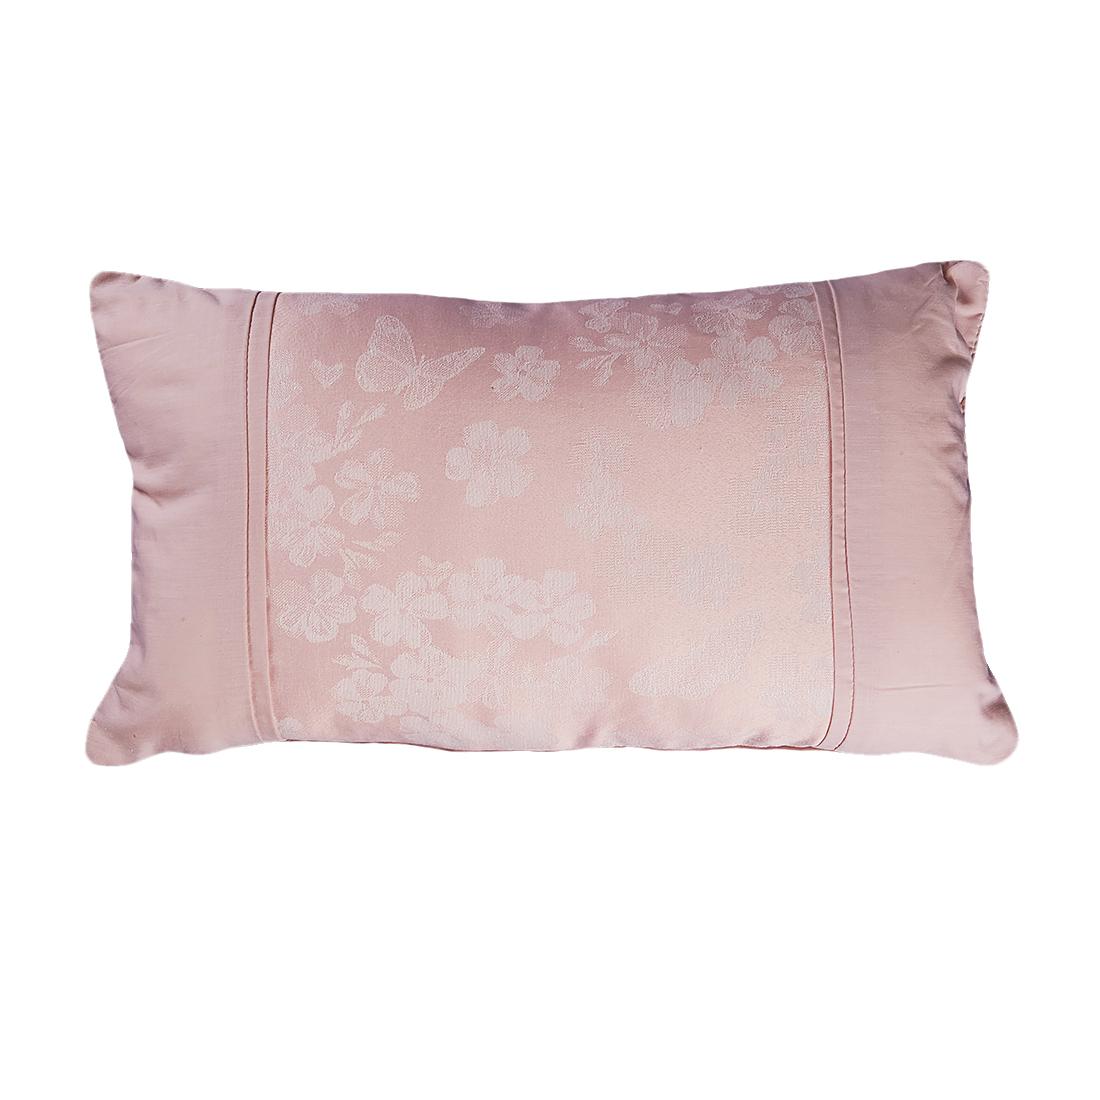 Blossom Blush Breakfast Cushion